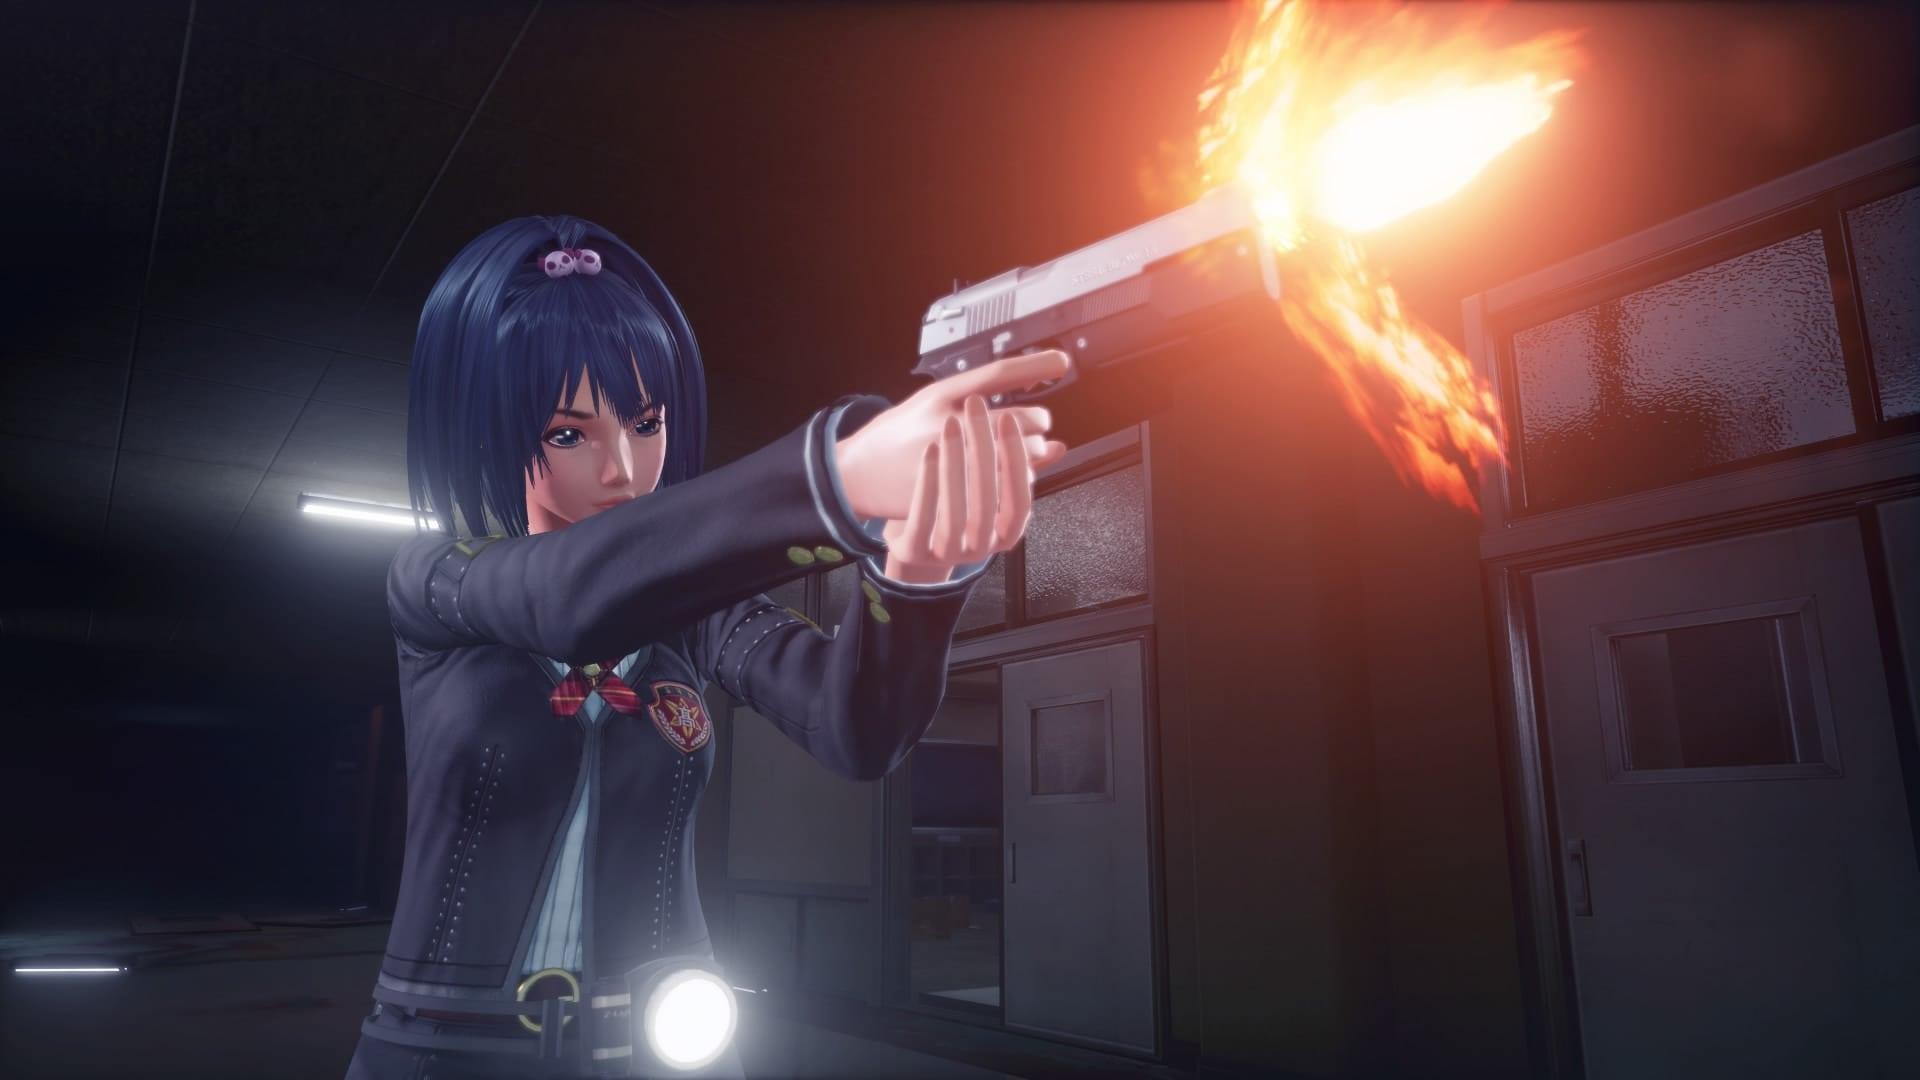 【TGS 16】殭屍的目標是衣服?PS4 射擊動作新作《女高中生殭屍獵人》公開《SG/ZH School Girl/Zombie Hunter》